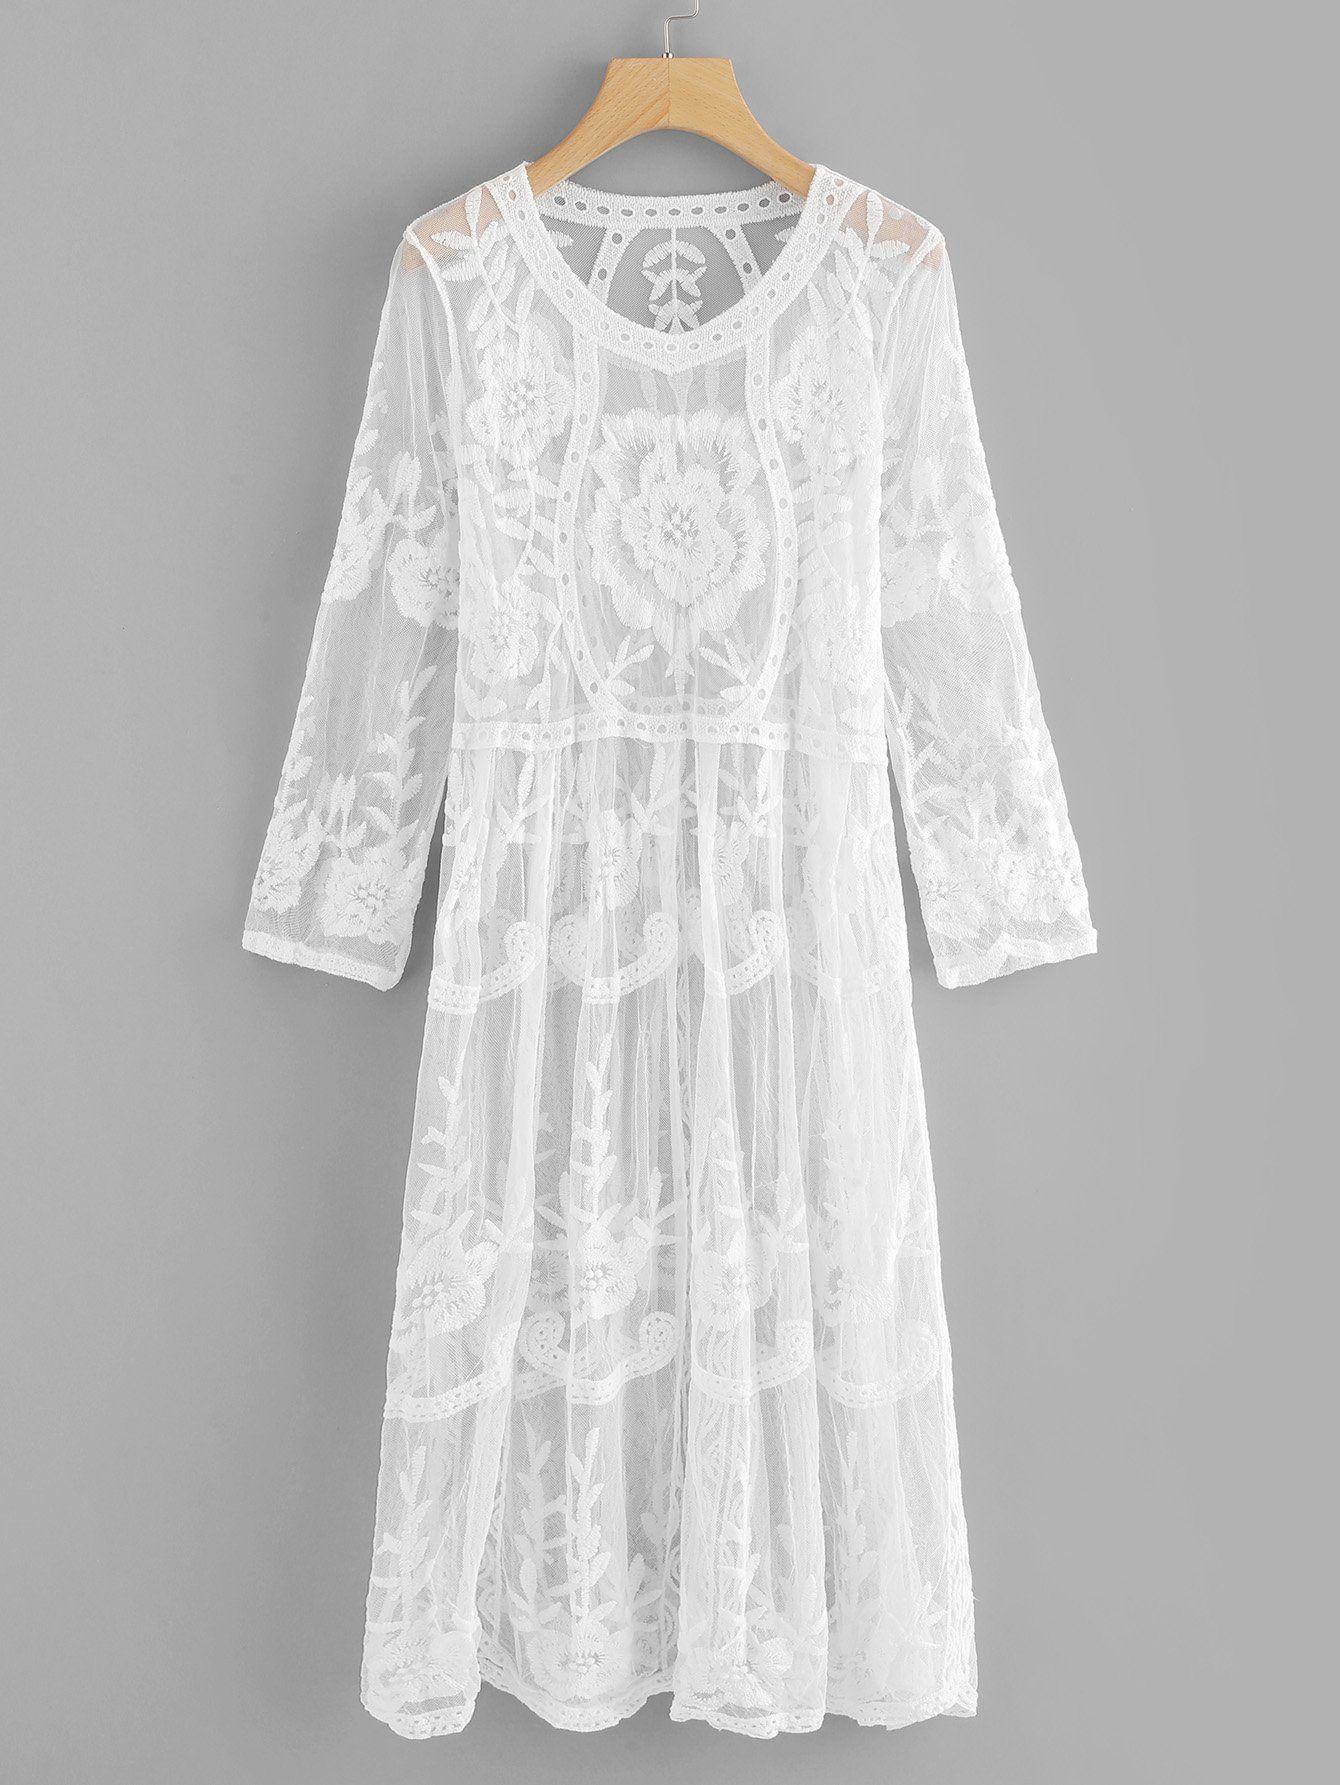 Robe brodée fleurie en dentelle transparentefrench romwe mode